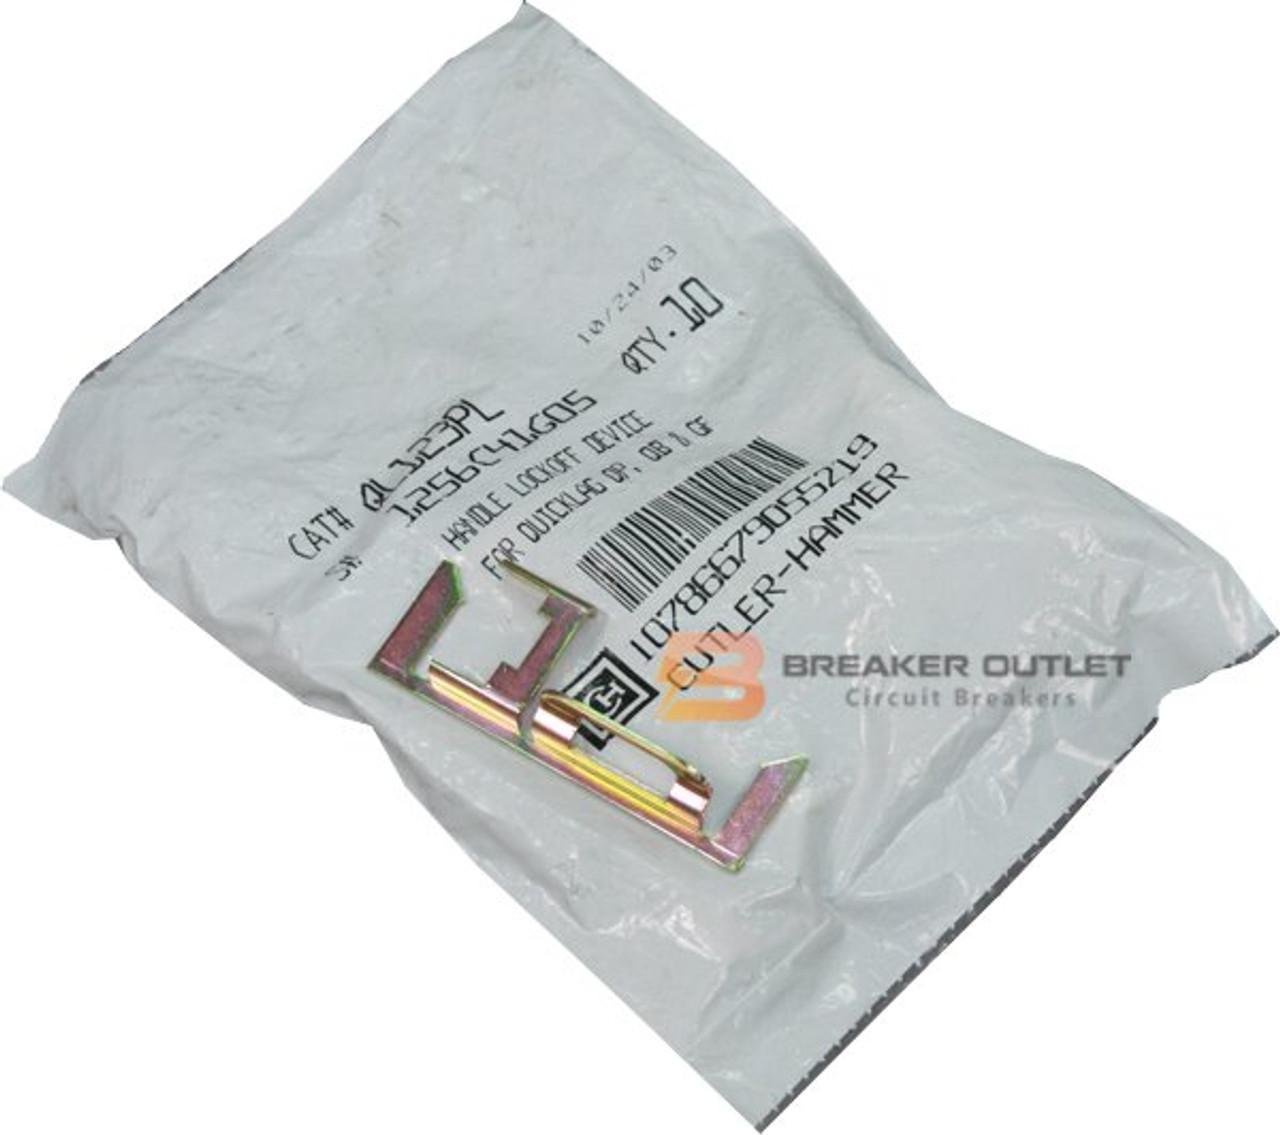 QL123PL circuit breaker padlock - Breaker Outlet